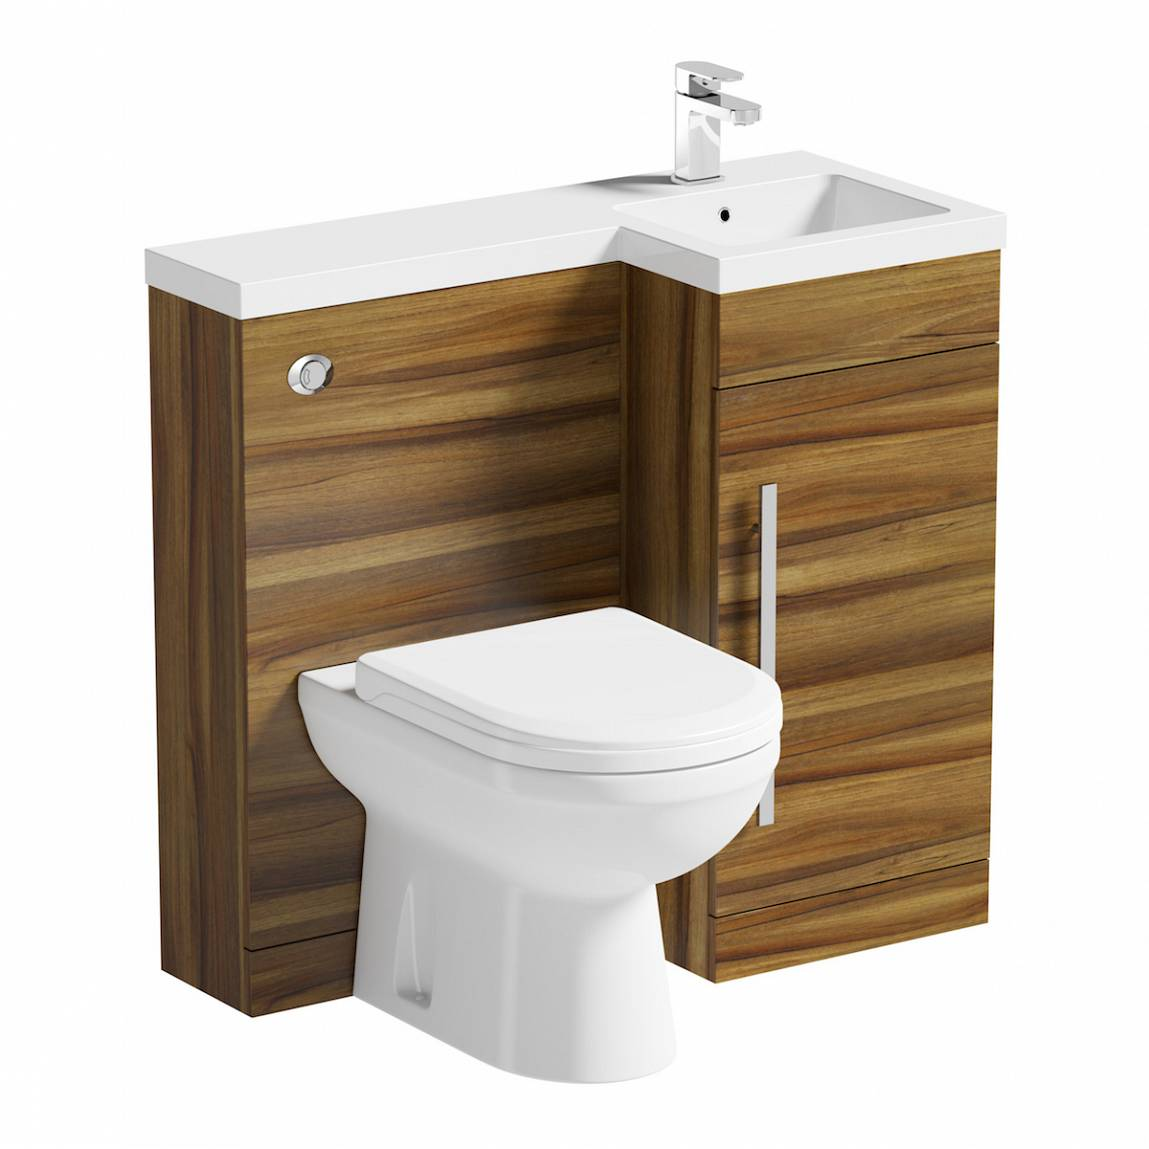 Image of MySpace Walnut Combination Unit RH with Autograph BTW Toilet